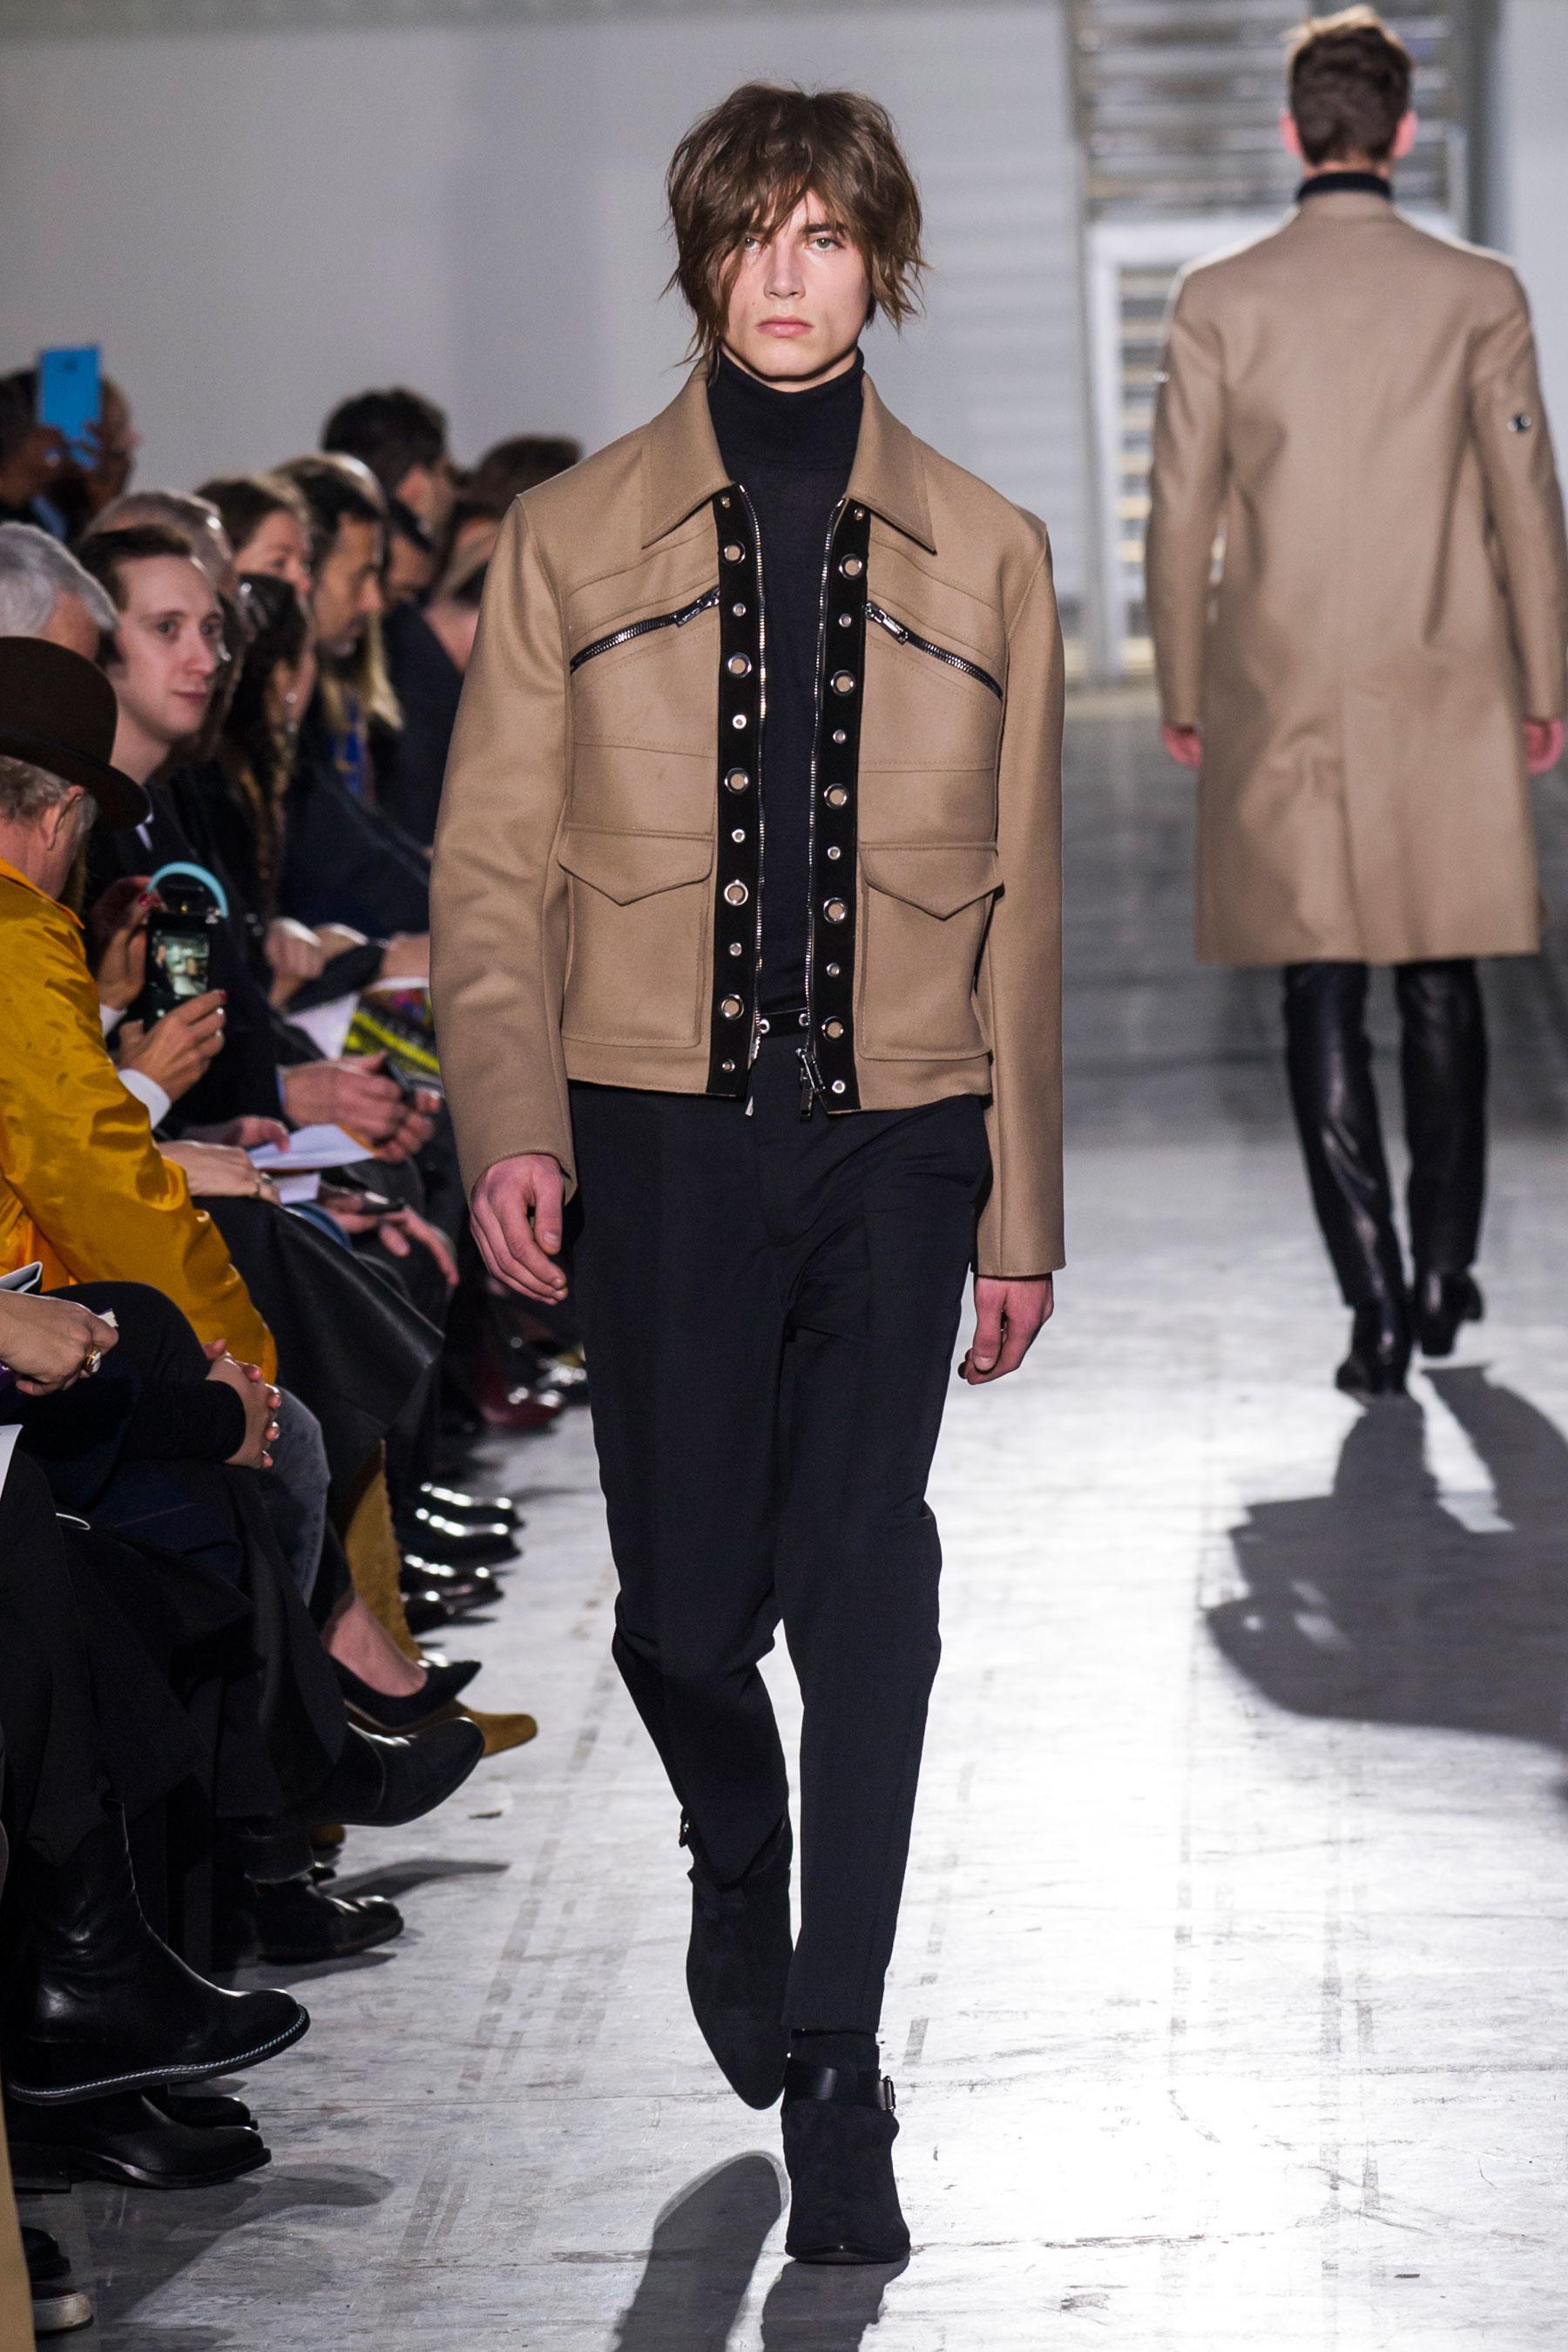 Défilé Costume National Automne-hiver 2015-2016 Homme - Madame Figaro a50e7396026